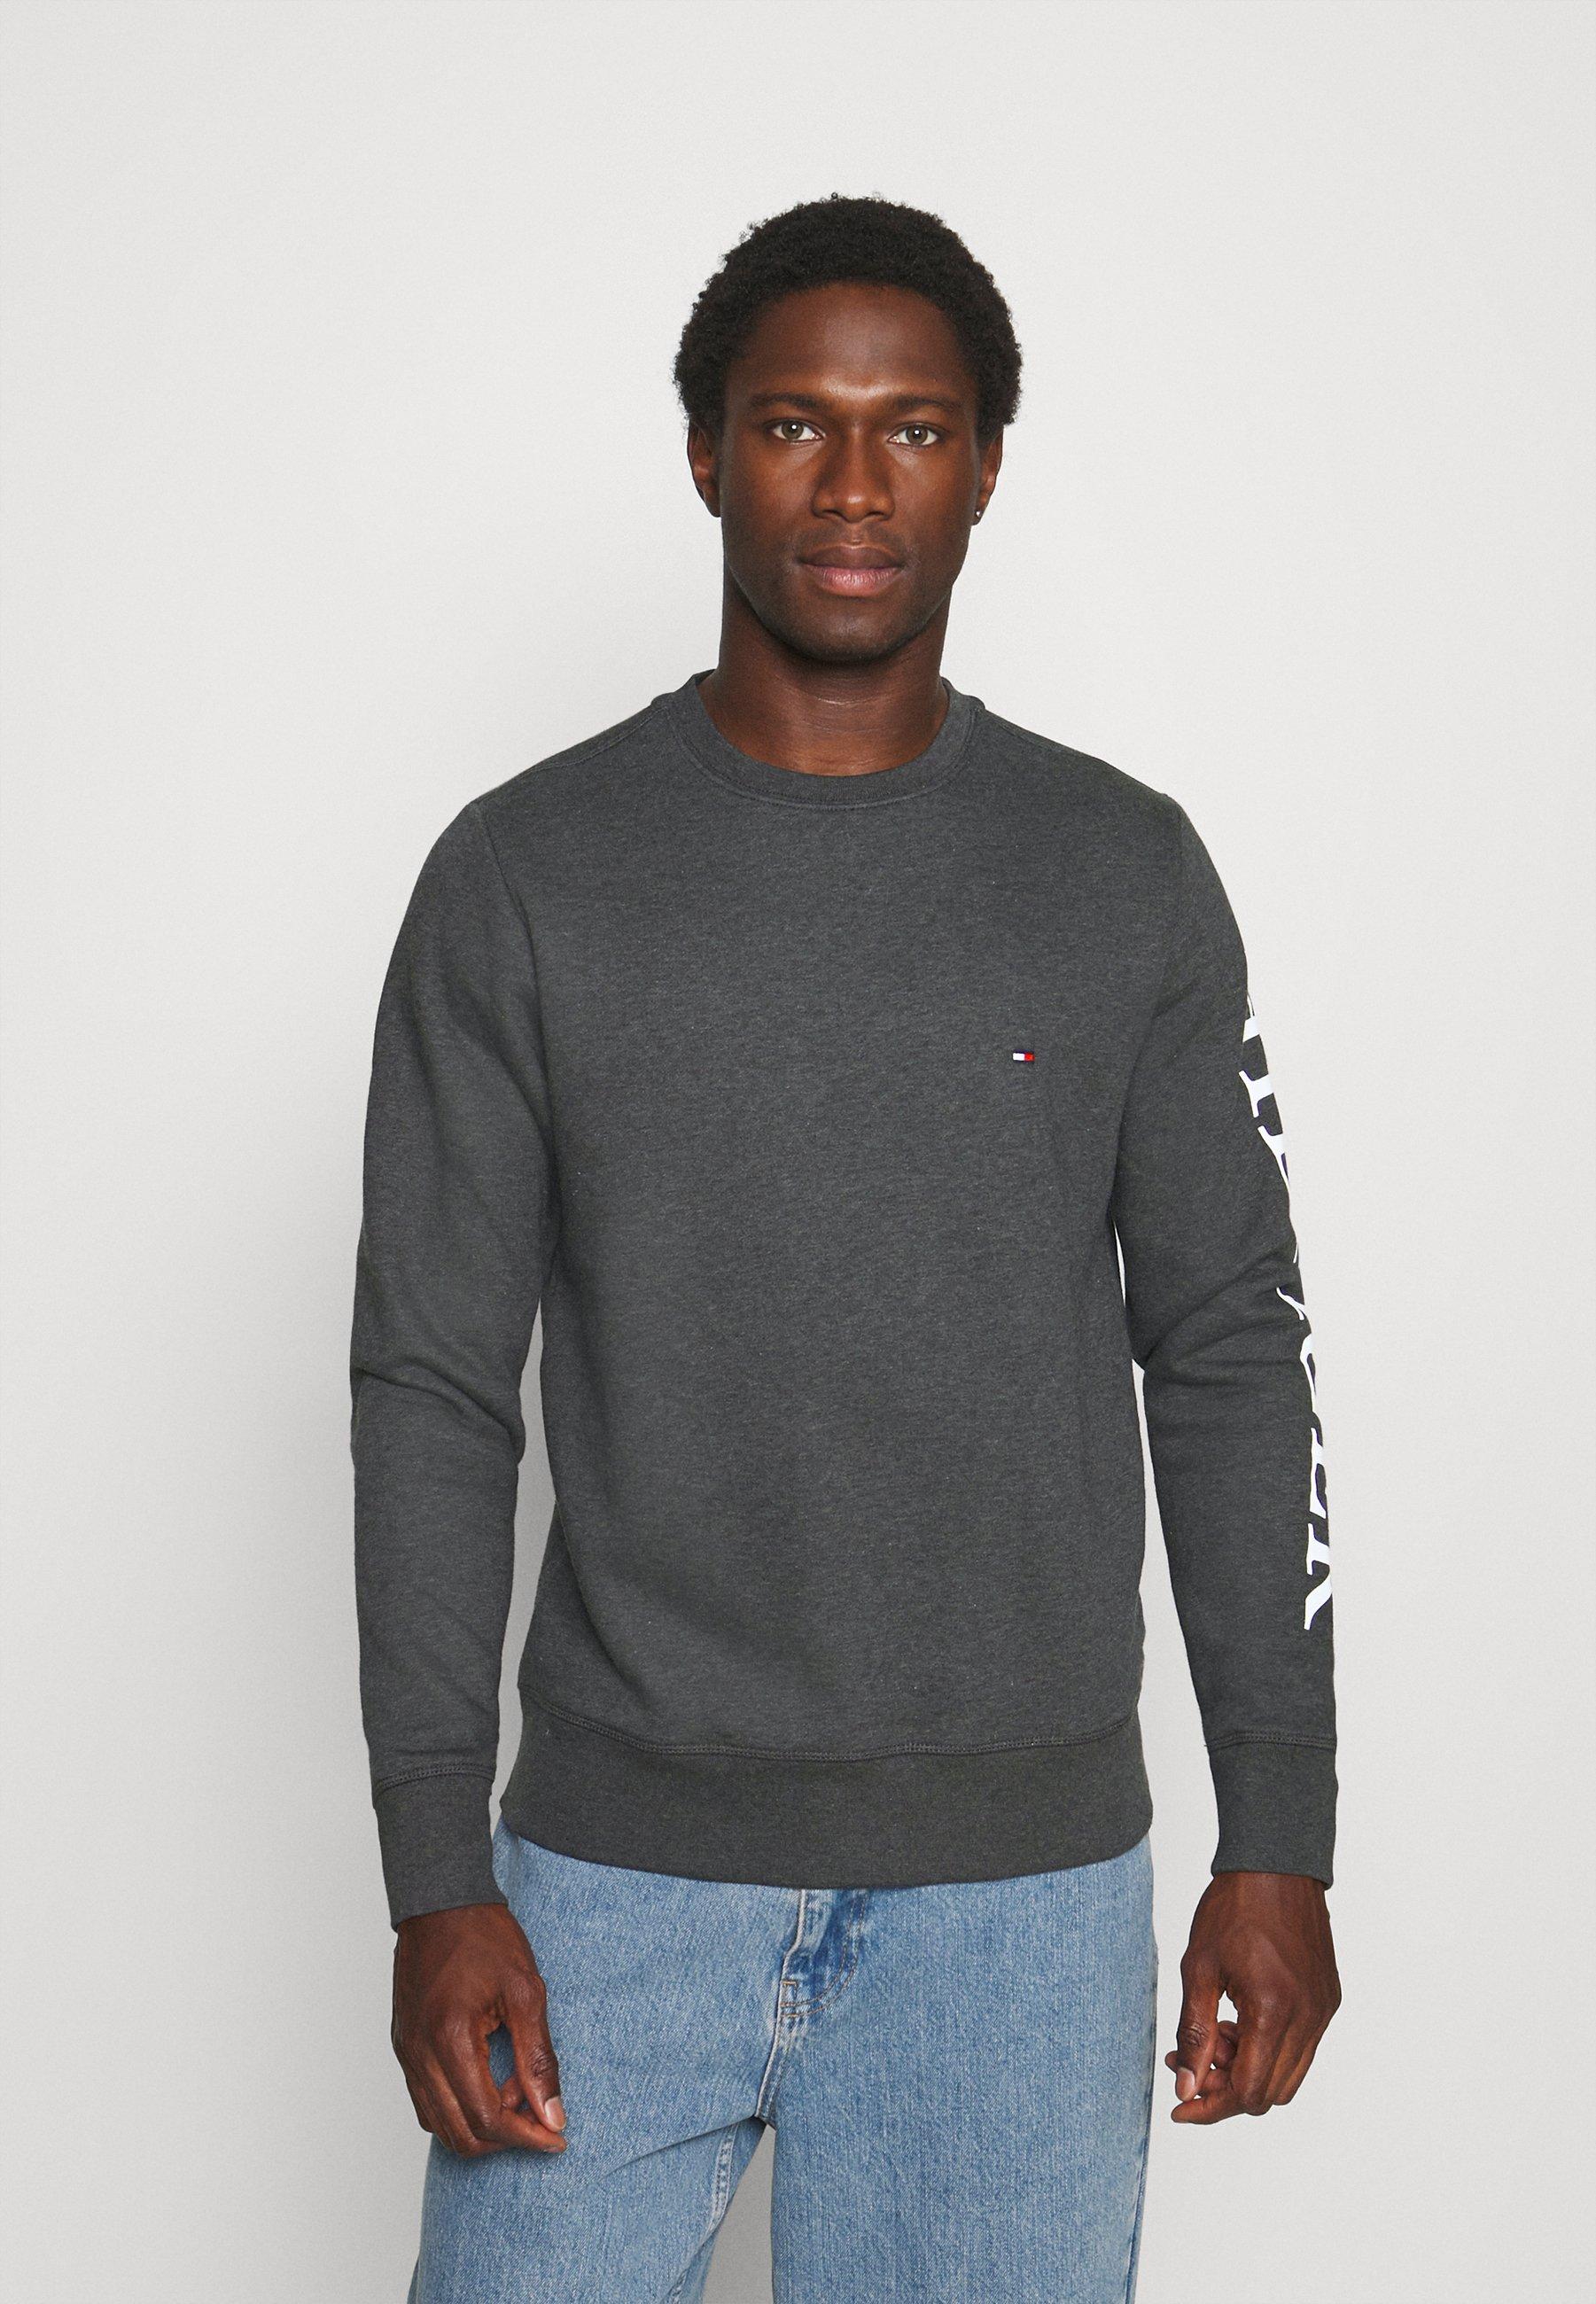 Men LOGO ON SLEEVE CREWNECK - Sweatshirt